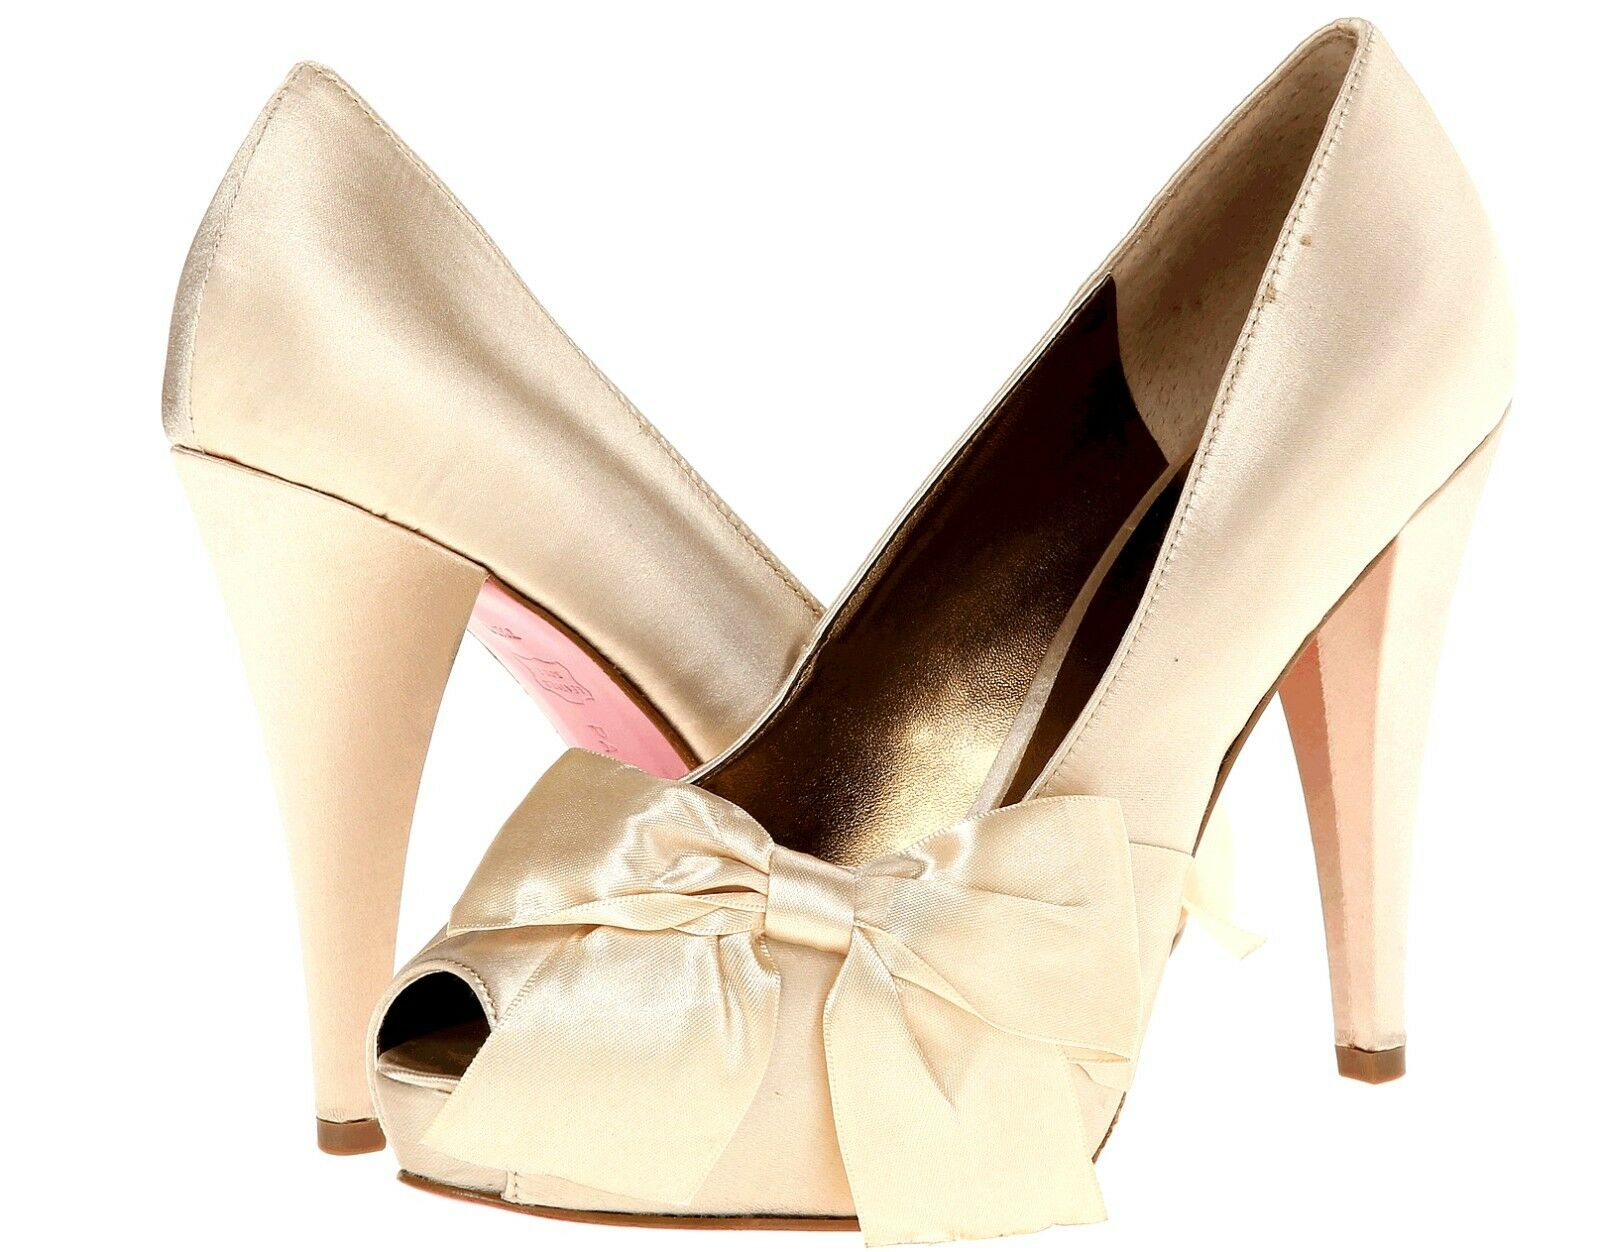 New Paris Hilton Destiny ivory  satin Damens's heel schuhe 155  Größe 8.5 (MSR 155 schuhe ) be98f0